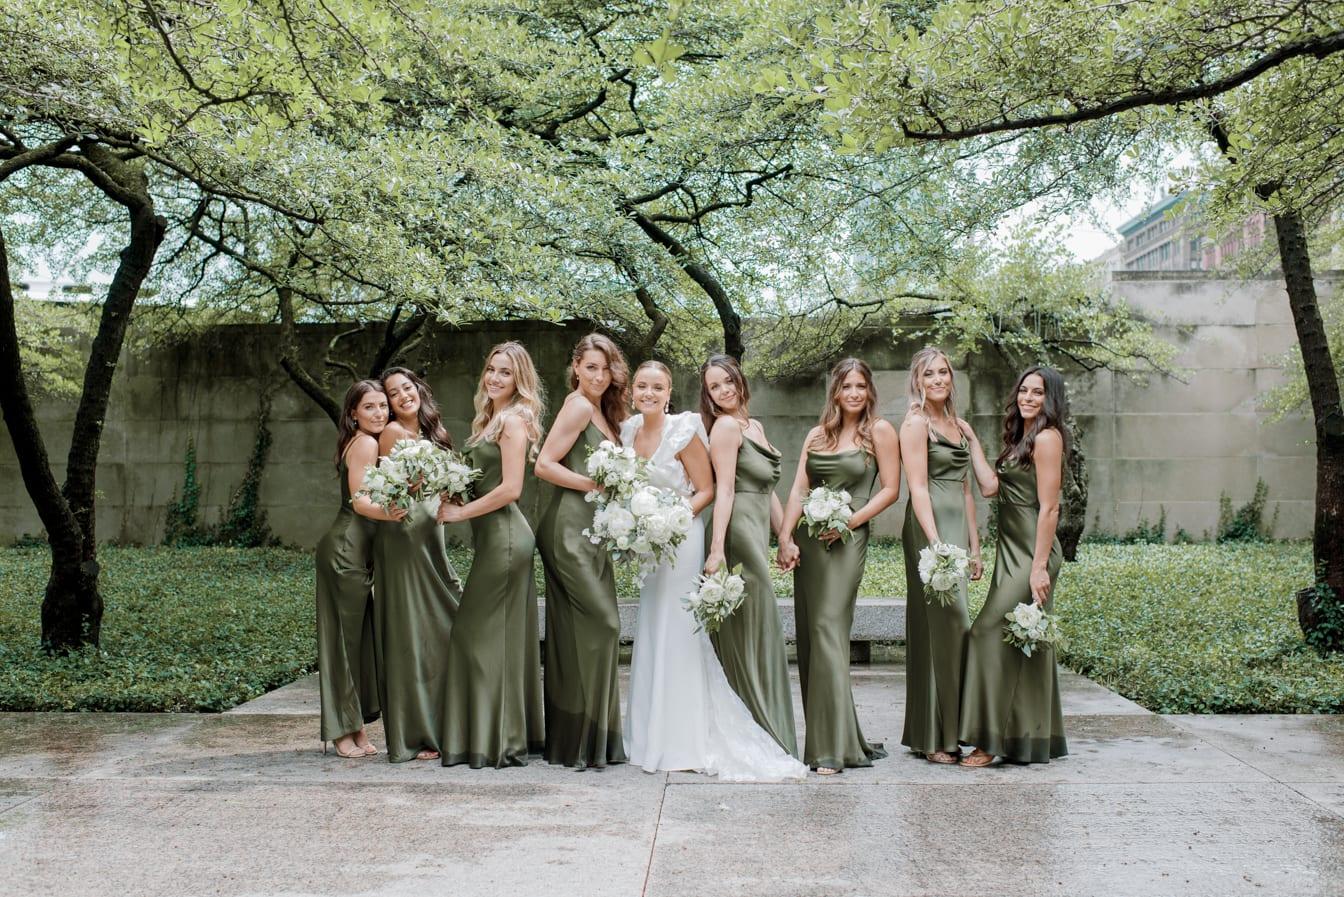 Bride with her bridesmaids smiling at Chicago Art Institute Garden